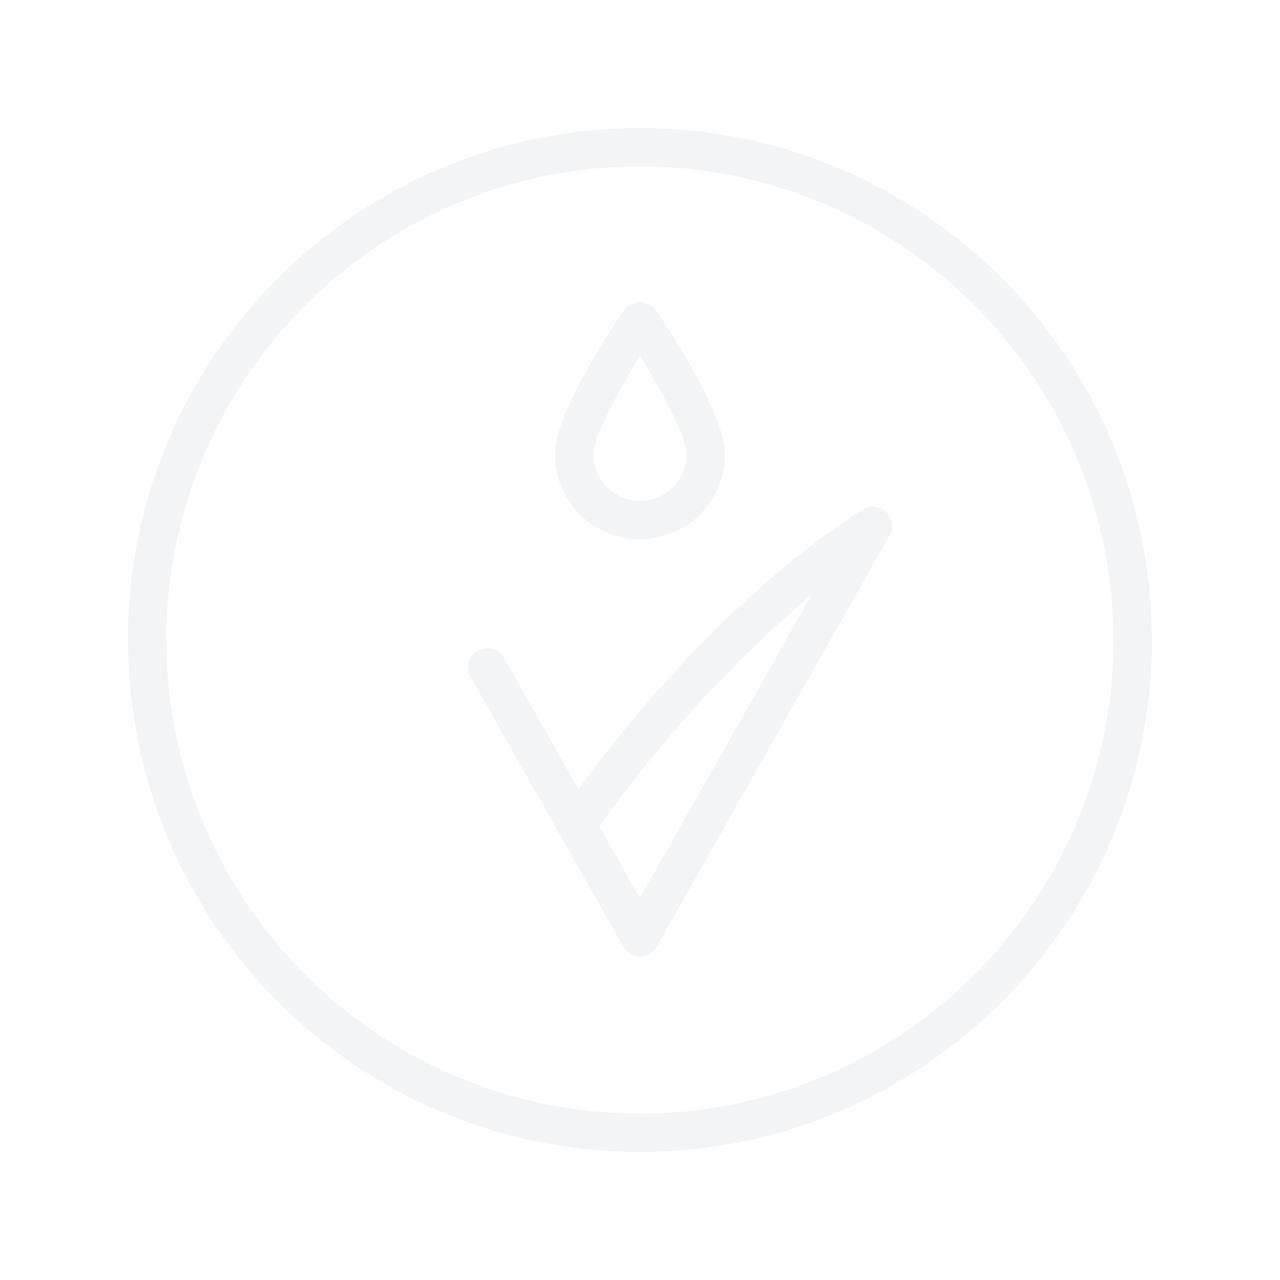 Dior Diorshow Iconic Curler Mascara No.090 Black 10ml